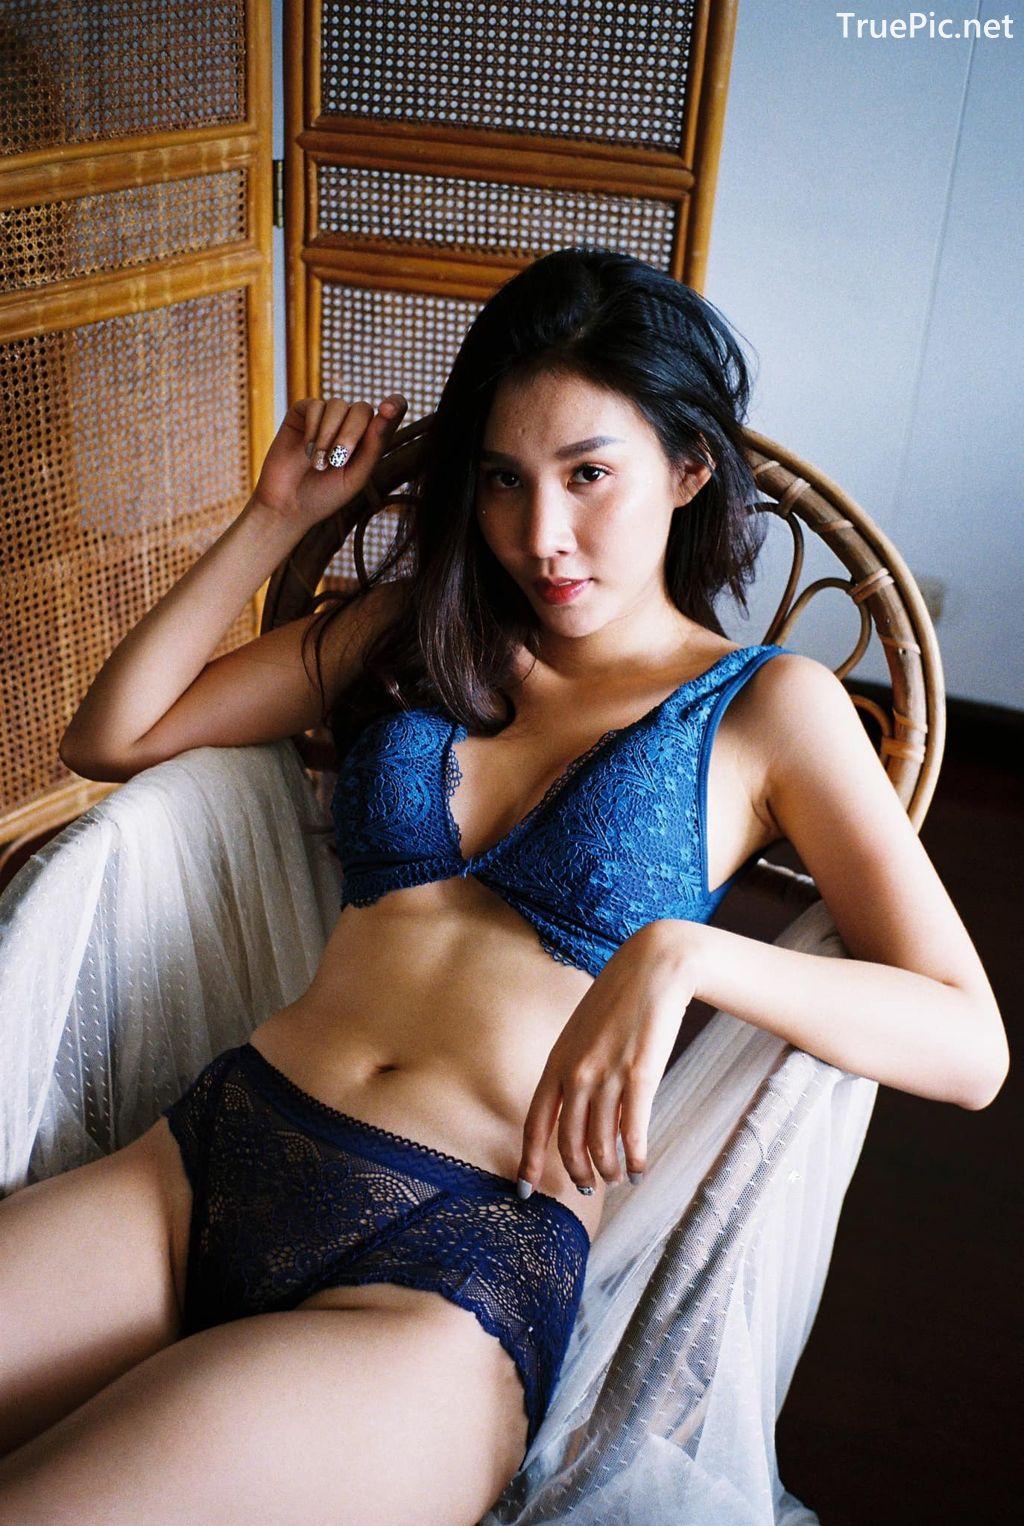 Image-Thailand-Model-Ssomch-Tanass-Blue-Lingerie-TruePic.net-TruePic.net- Picture-7